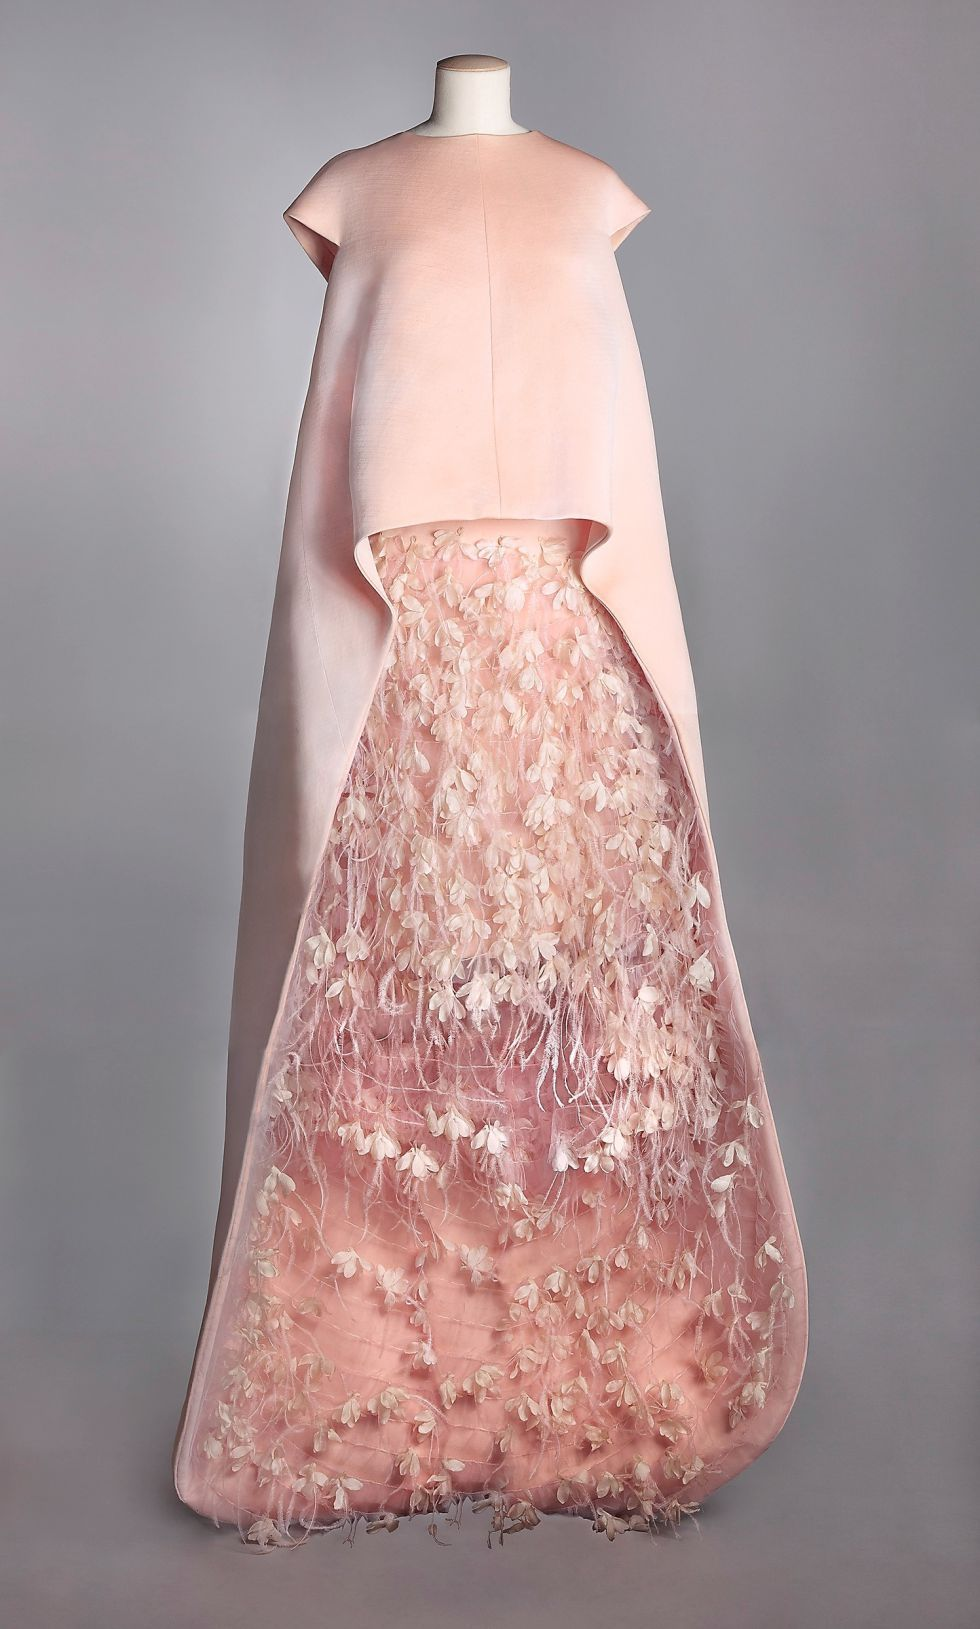 Desempolvar la alta costura | Pinterest | Vestido de tafetán, Pluma ...